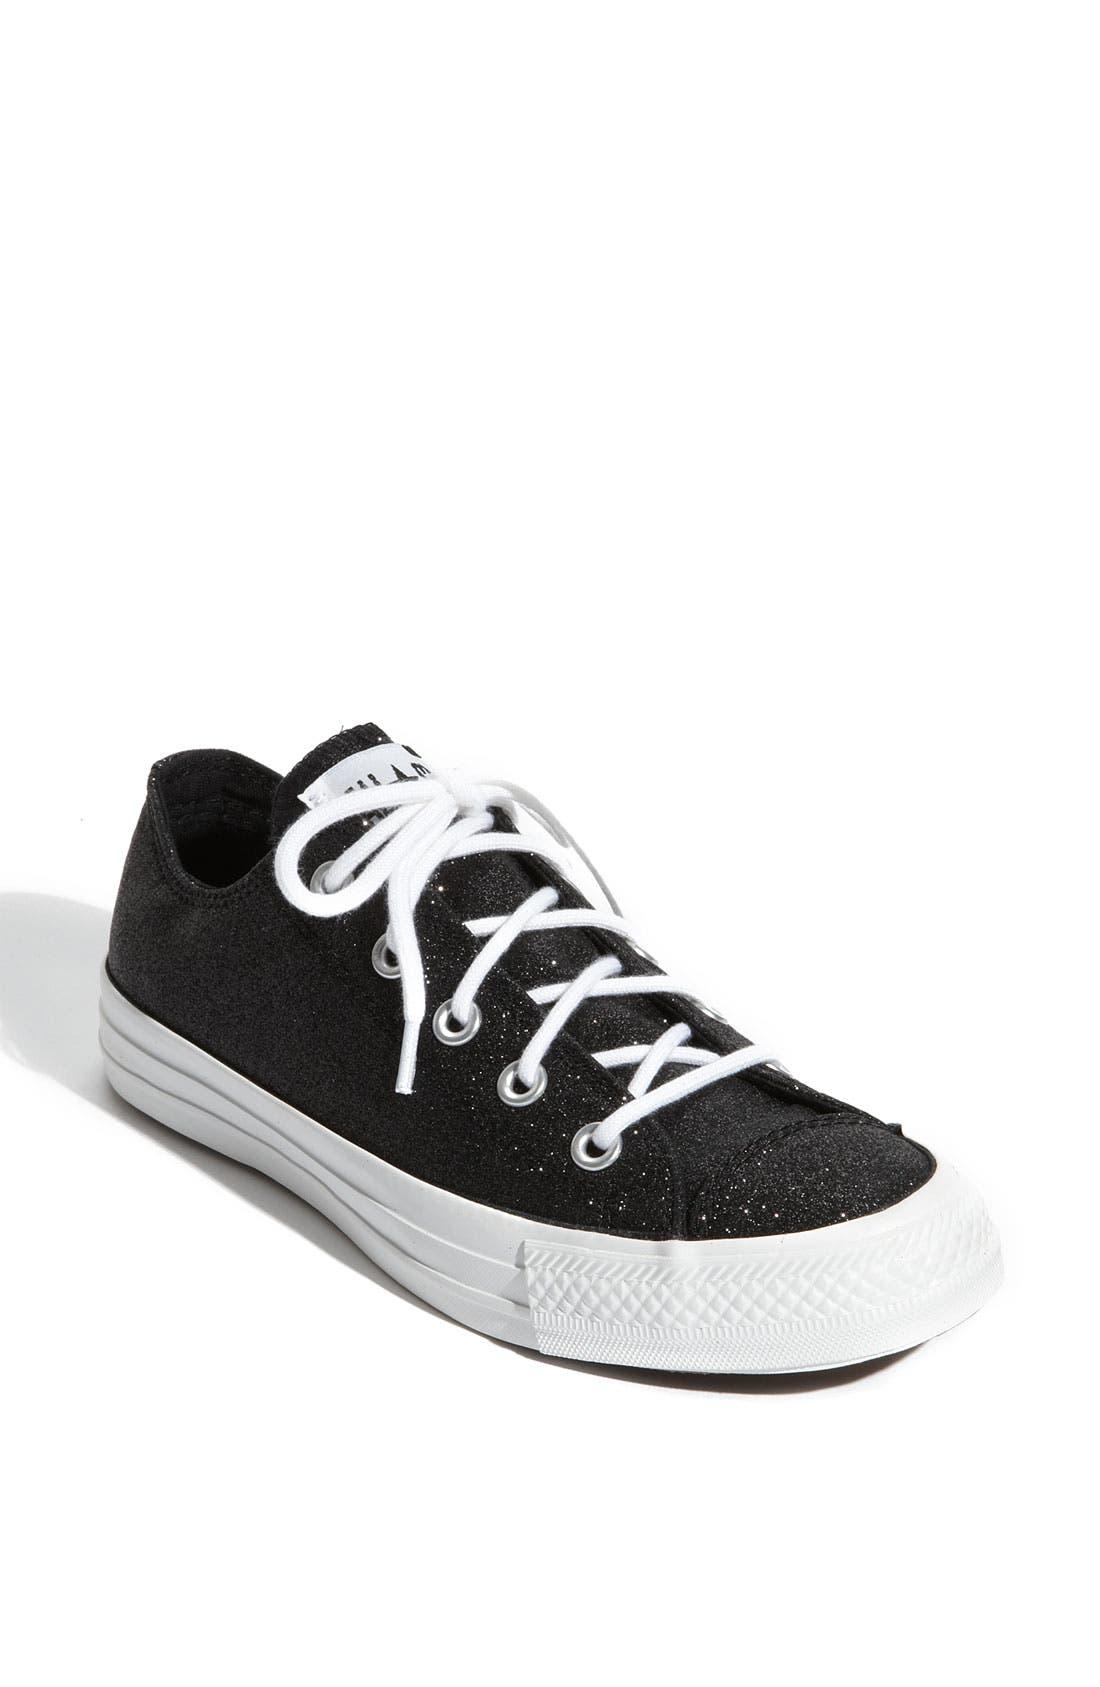 Chuck Taylor<sup>®</sup> 'Winter Glitz' Sneaker,                             Main thumbnail 1, color,                             001